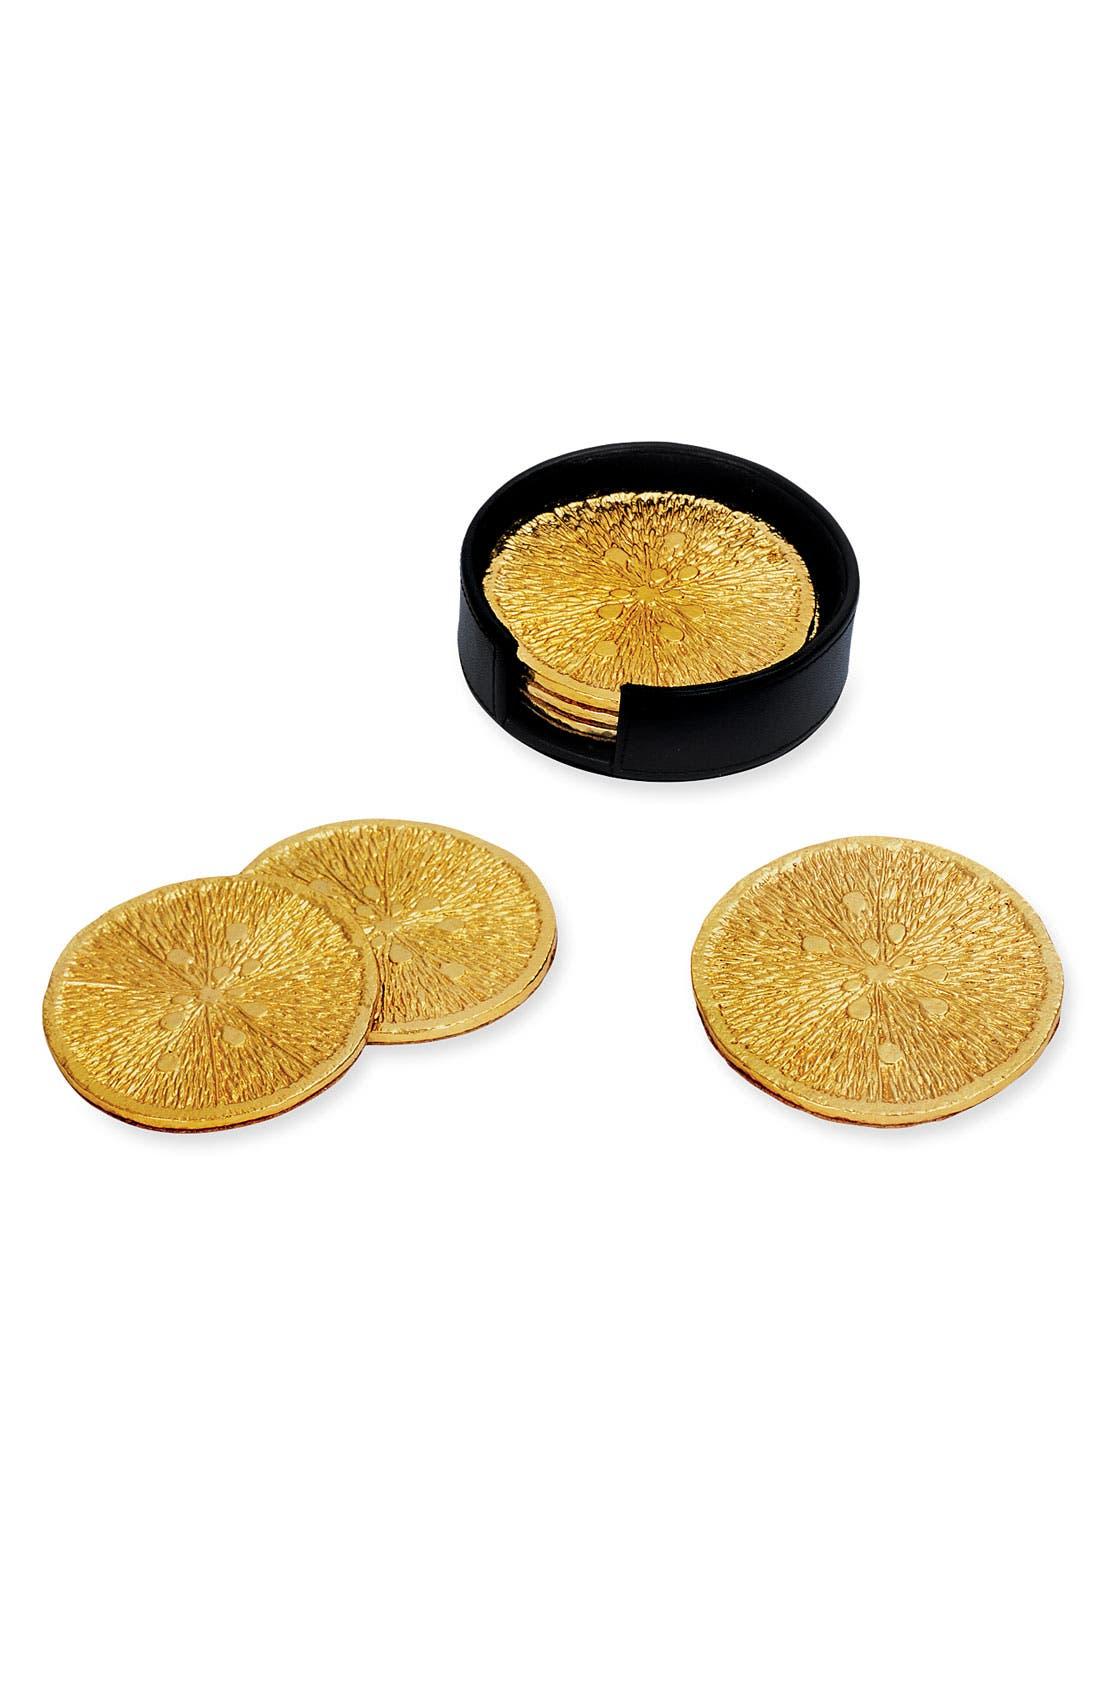 Alternate Image 1 Selected - Michael Aram 'Lemonwood' Coasters (Set of 6)